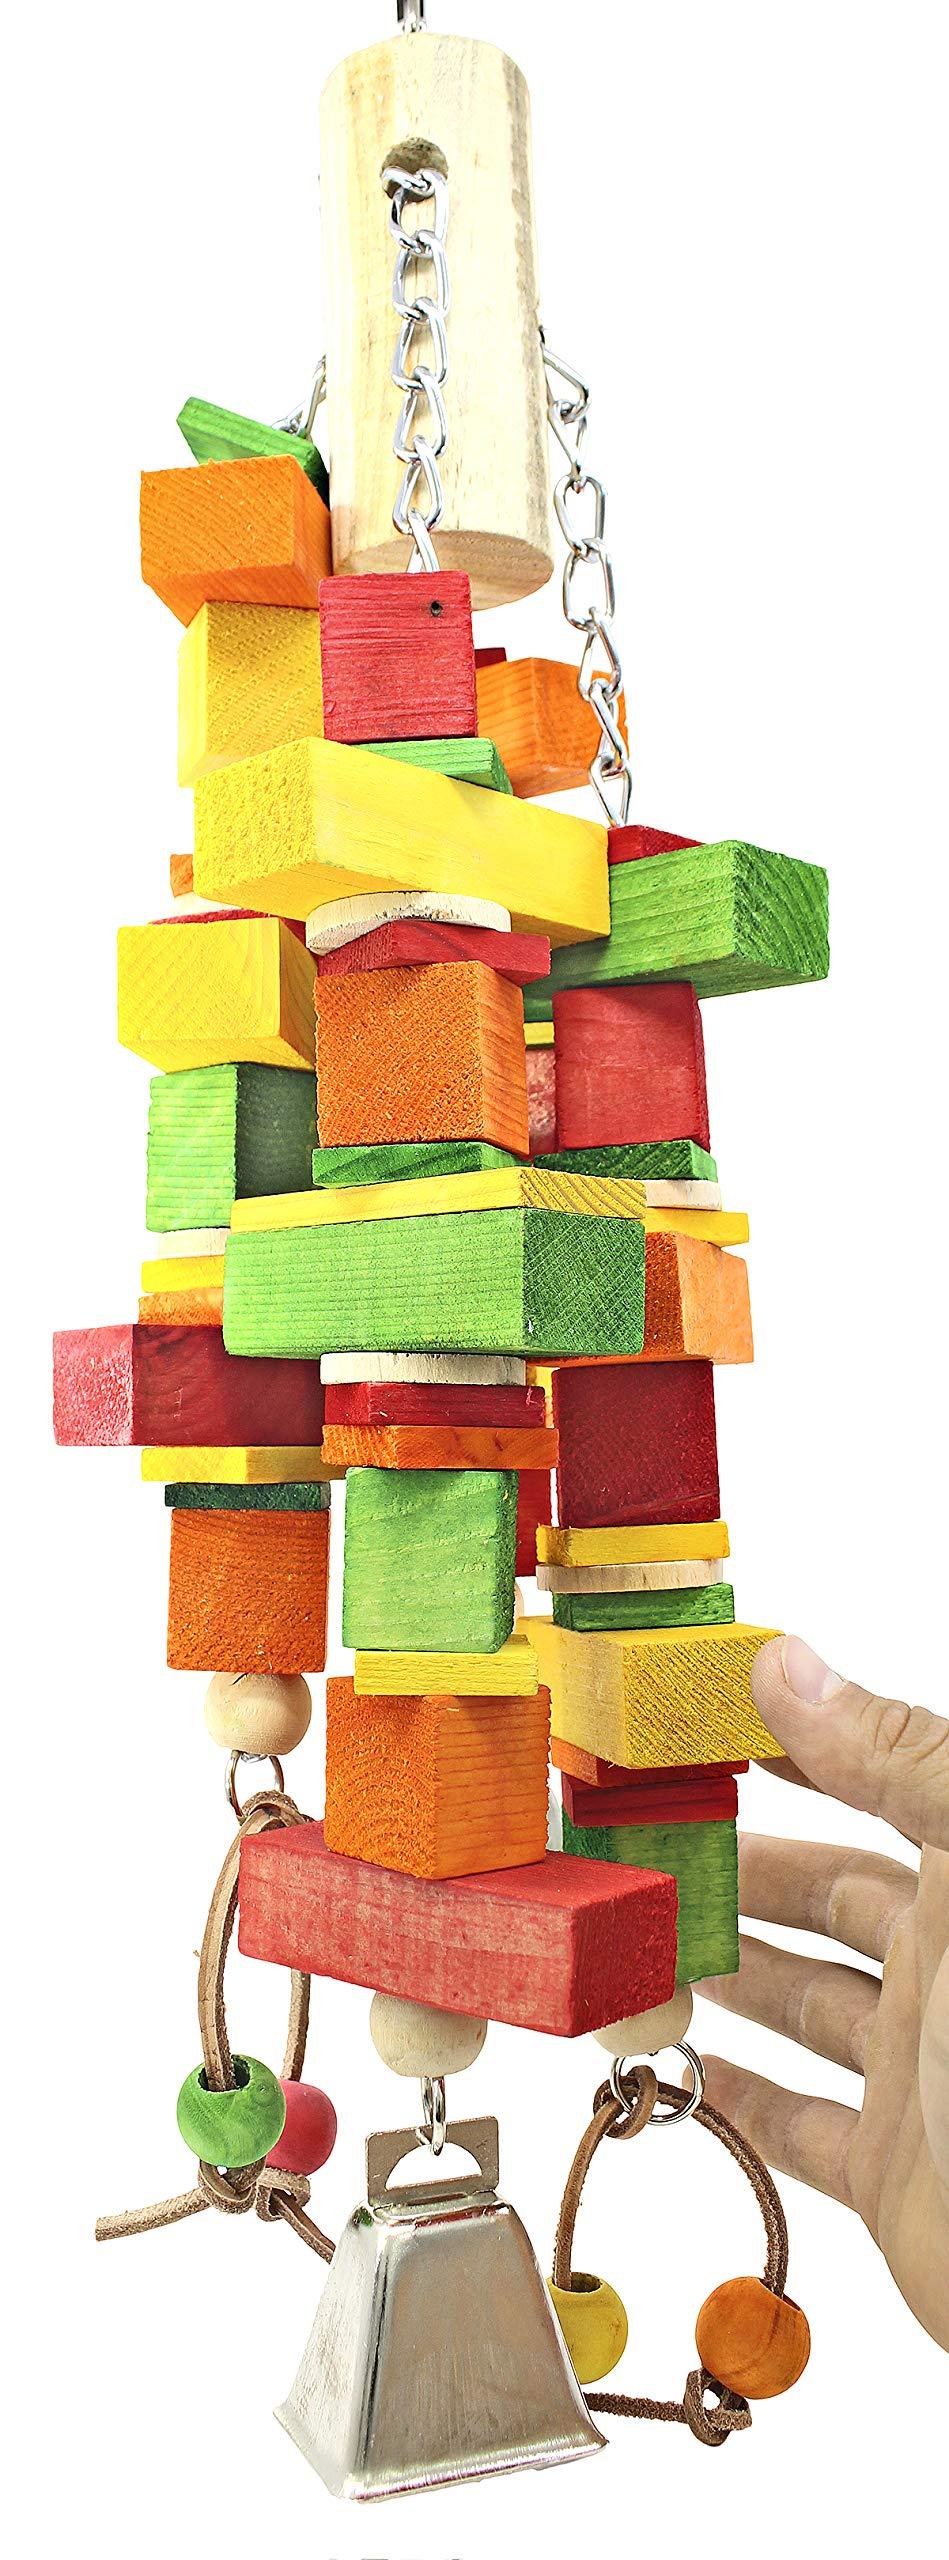 Bonka Bird Toys 1131 Giant Oblong Chew Huge Bird Toy by Bonka Bird Toys